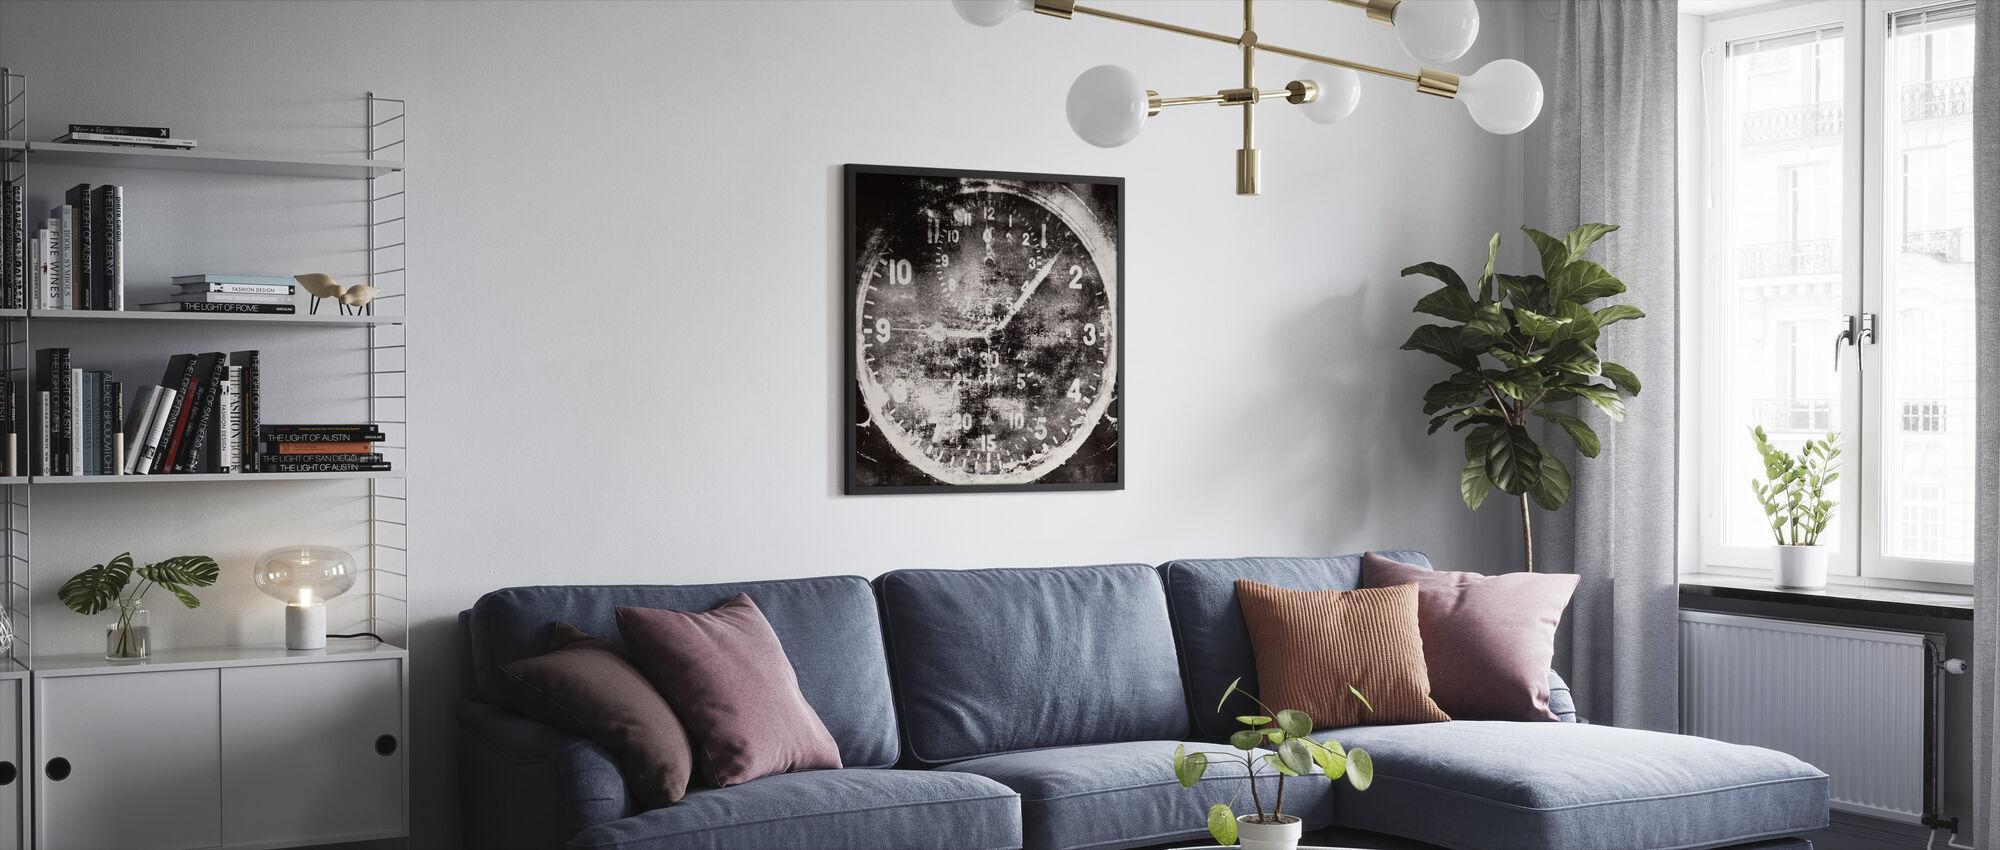 Vintage Airplane Clock - Framed print - Living Room